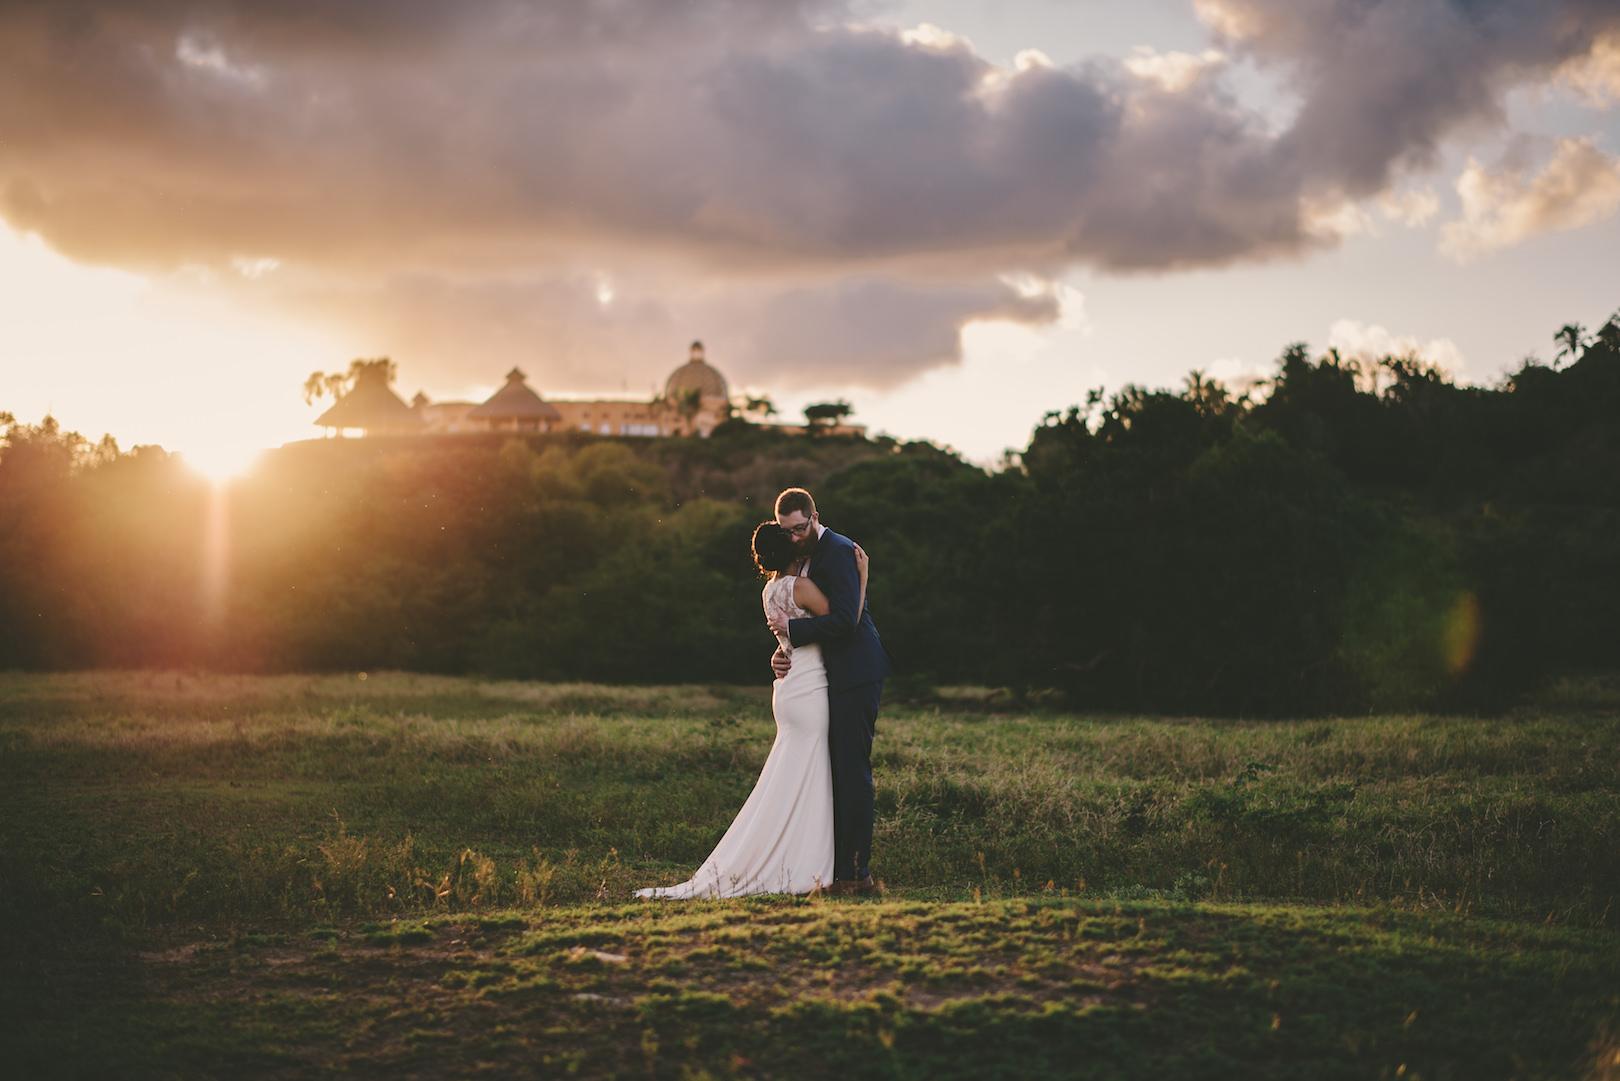 Nathan & Felicia - Wedding Day - © Dallas Kolotylo Photography - 535